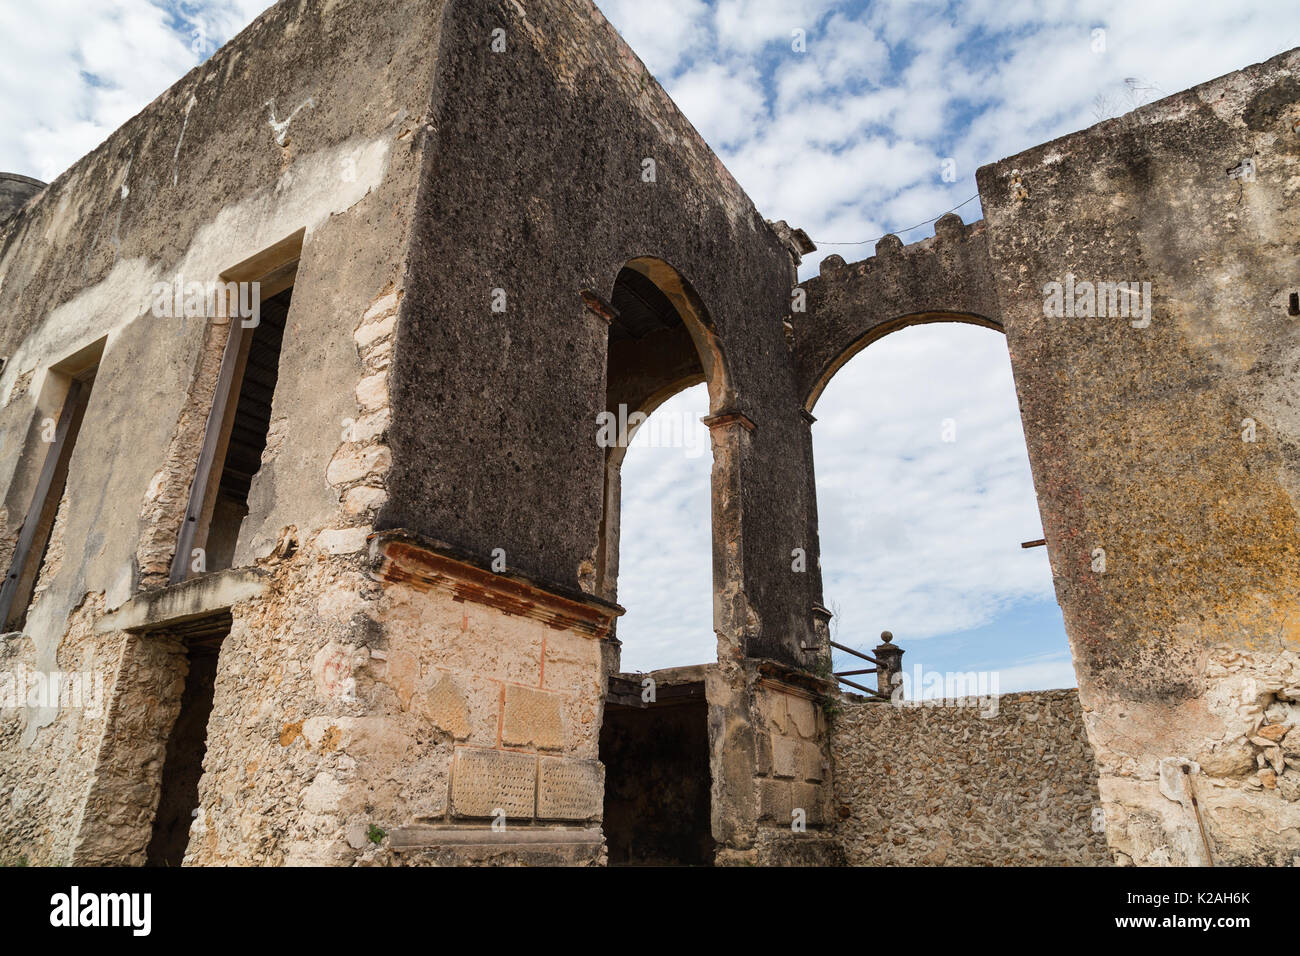 One of buildings at Hacienda Yaxcopoil, Yaxcopoil, Yucatan, Mexico. - Stock Image